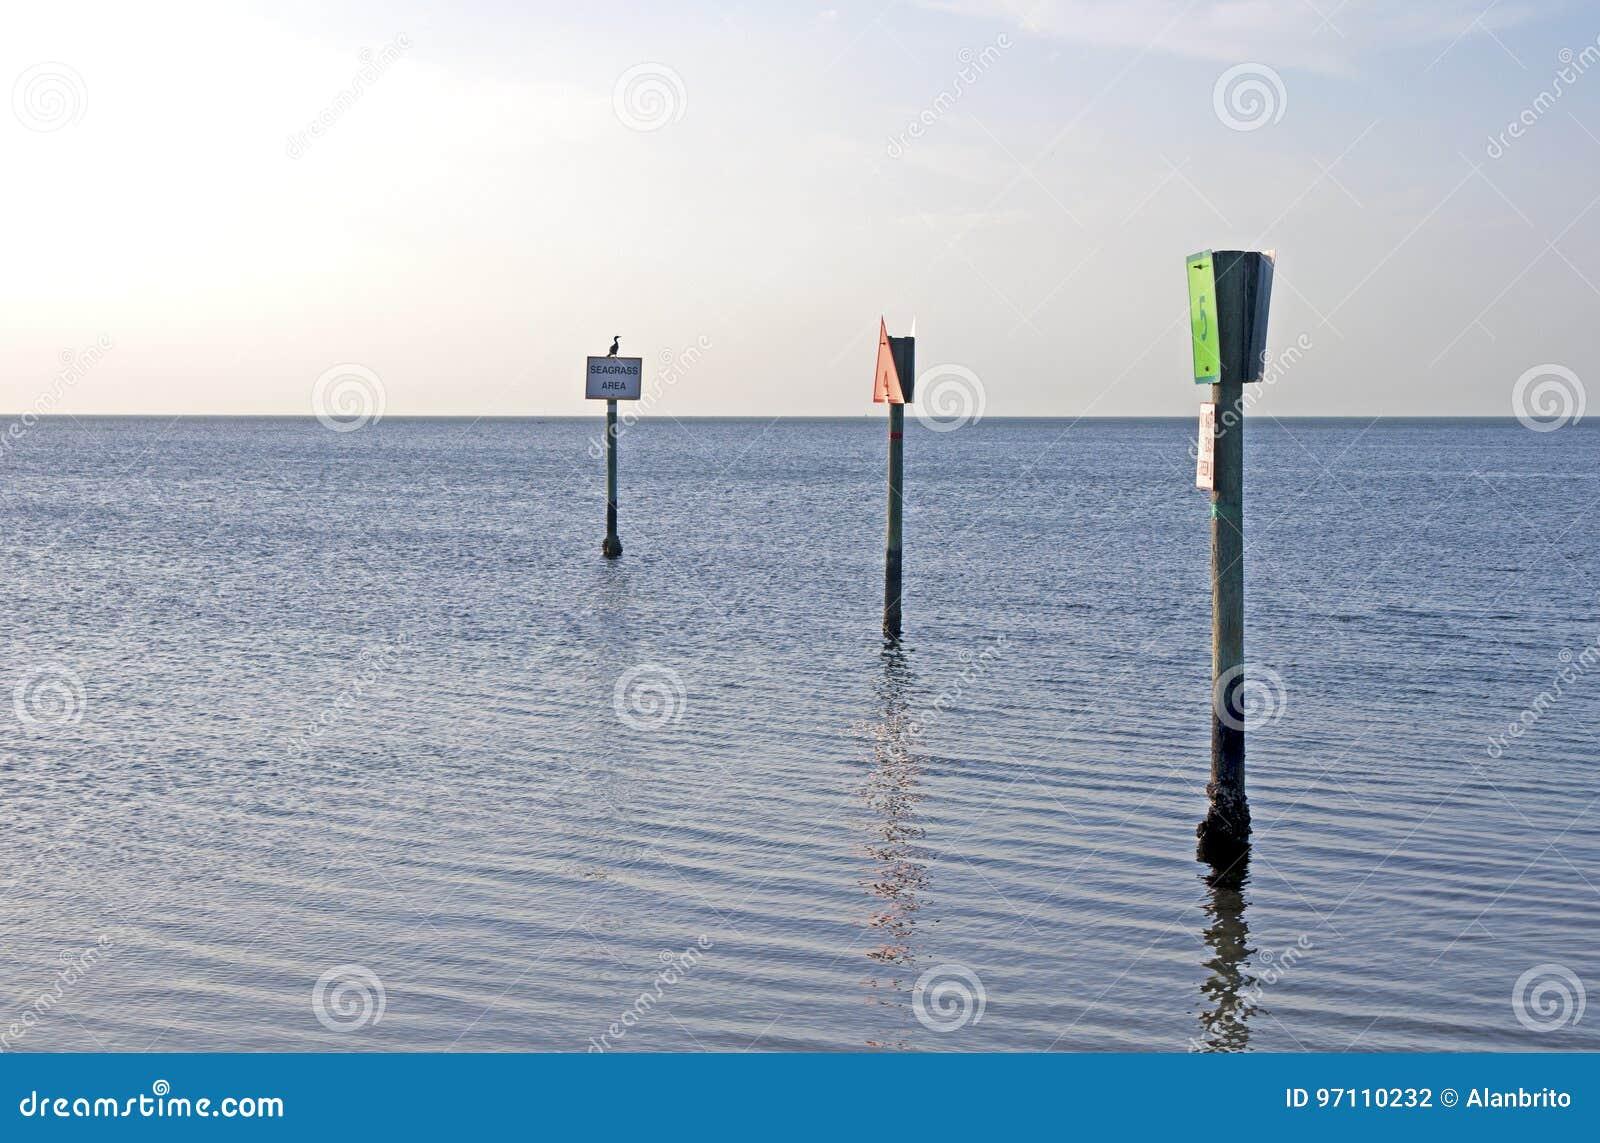 Warning signs in the ocean